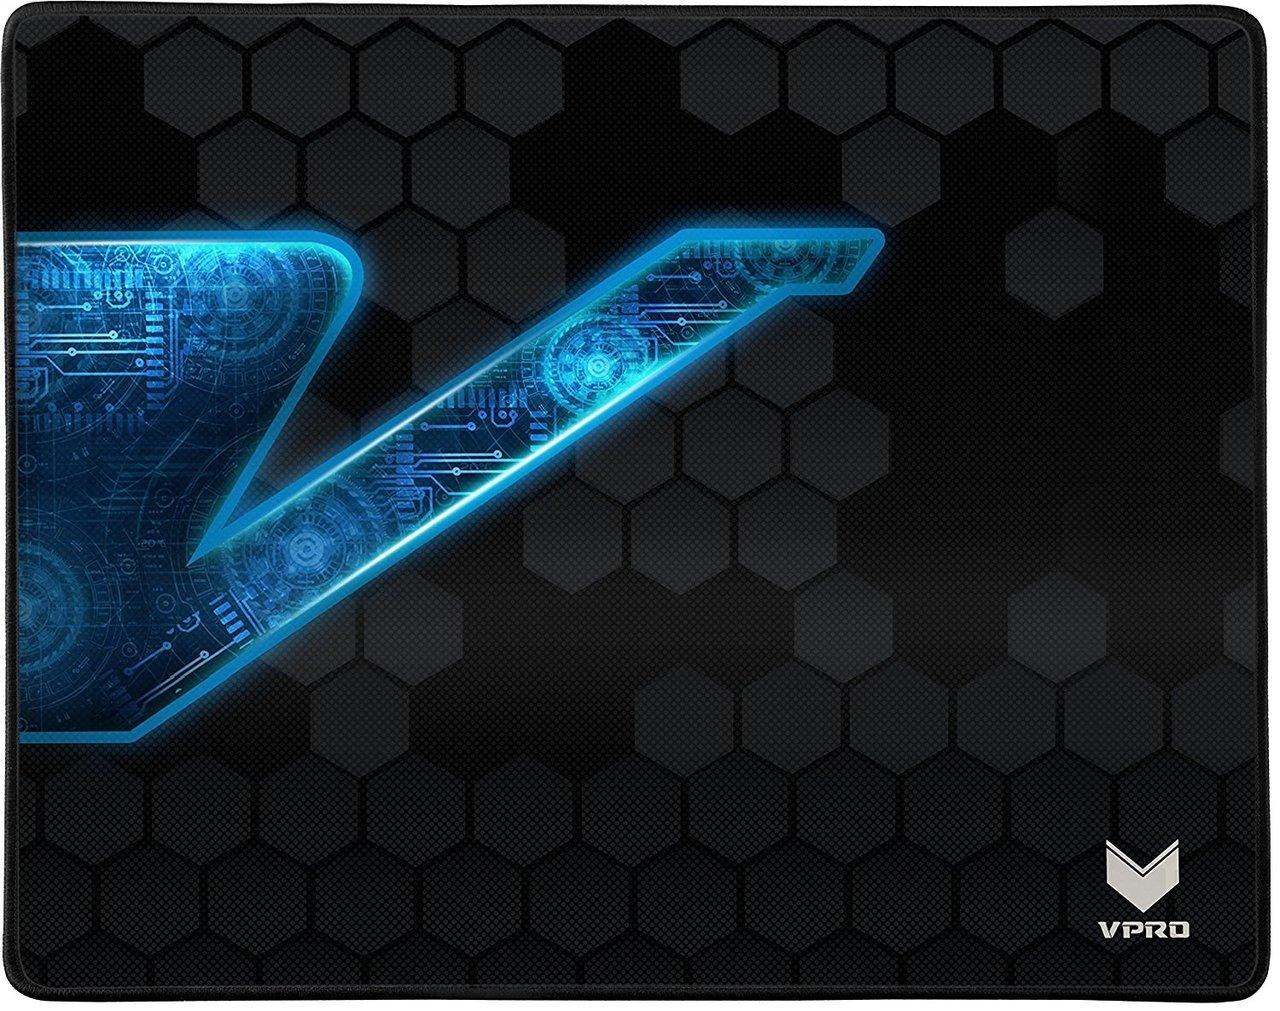 Rapoo VPRO V1000 Gaming Mouse Mat (Large) - Black